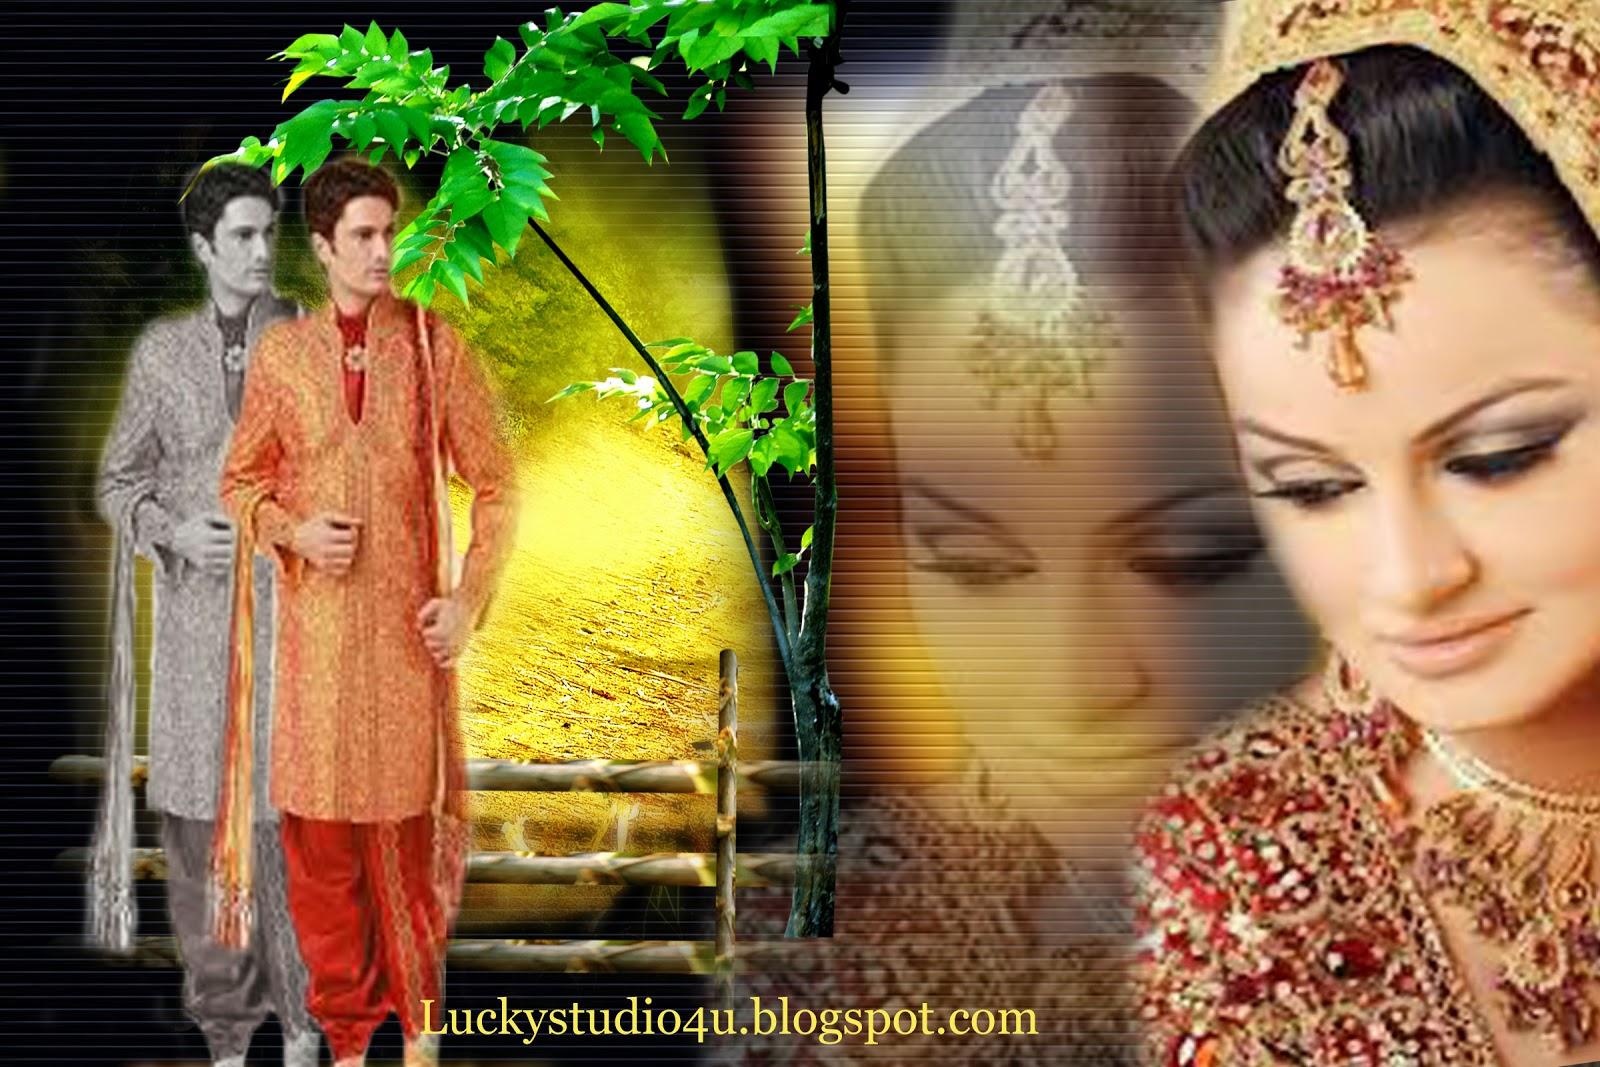 New Wedding Album Design Luckystudio4u